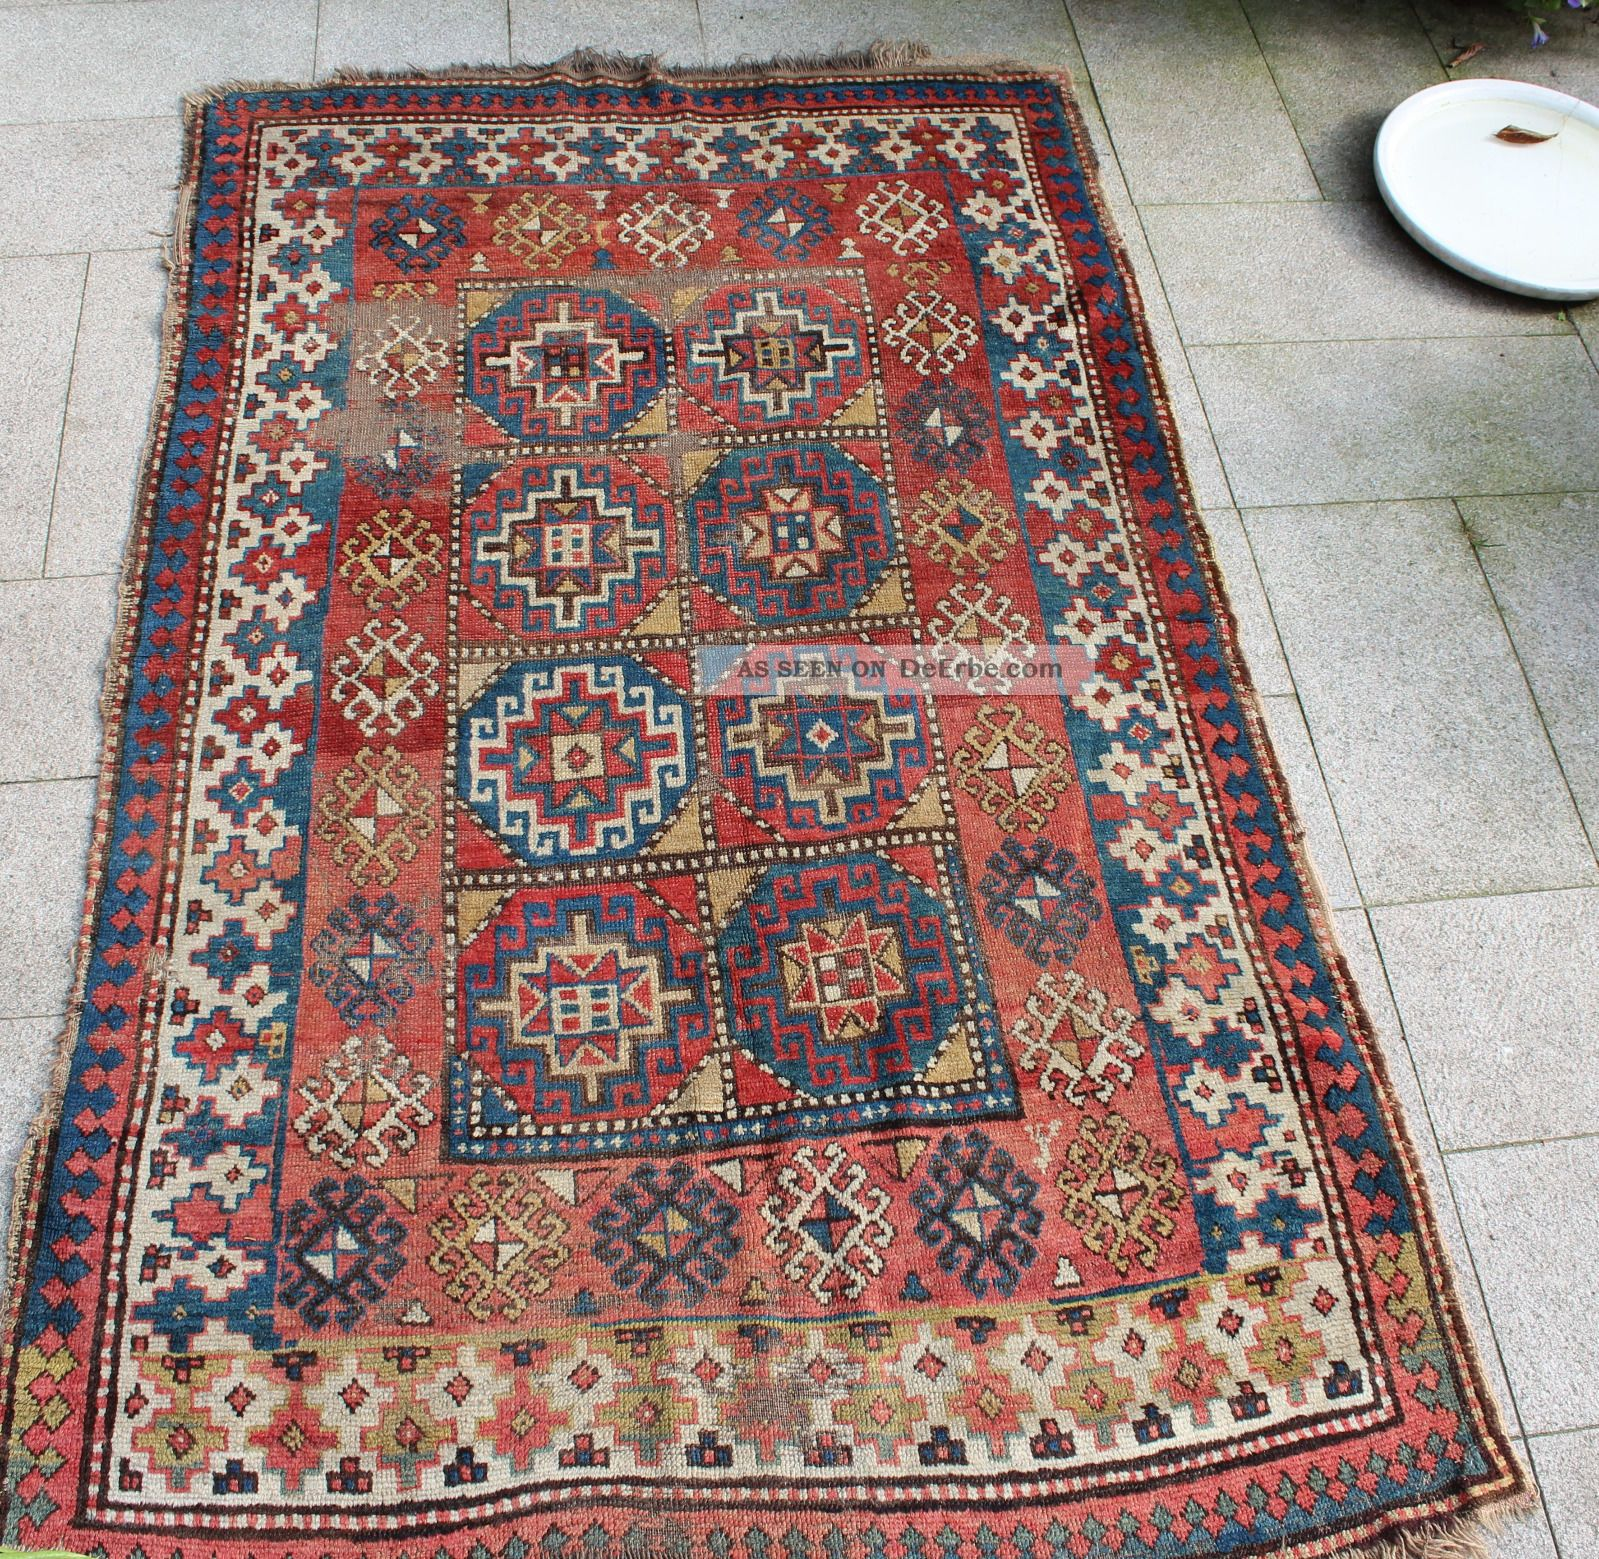 kaukasischer teppich antik 18 19 jahrhundert 220x140. Black Bedroom Furniture Sets. Home Design Ideas